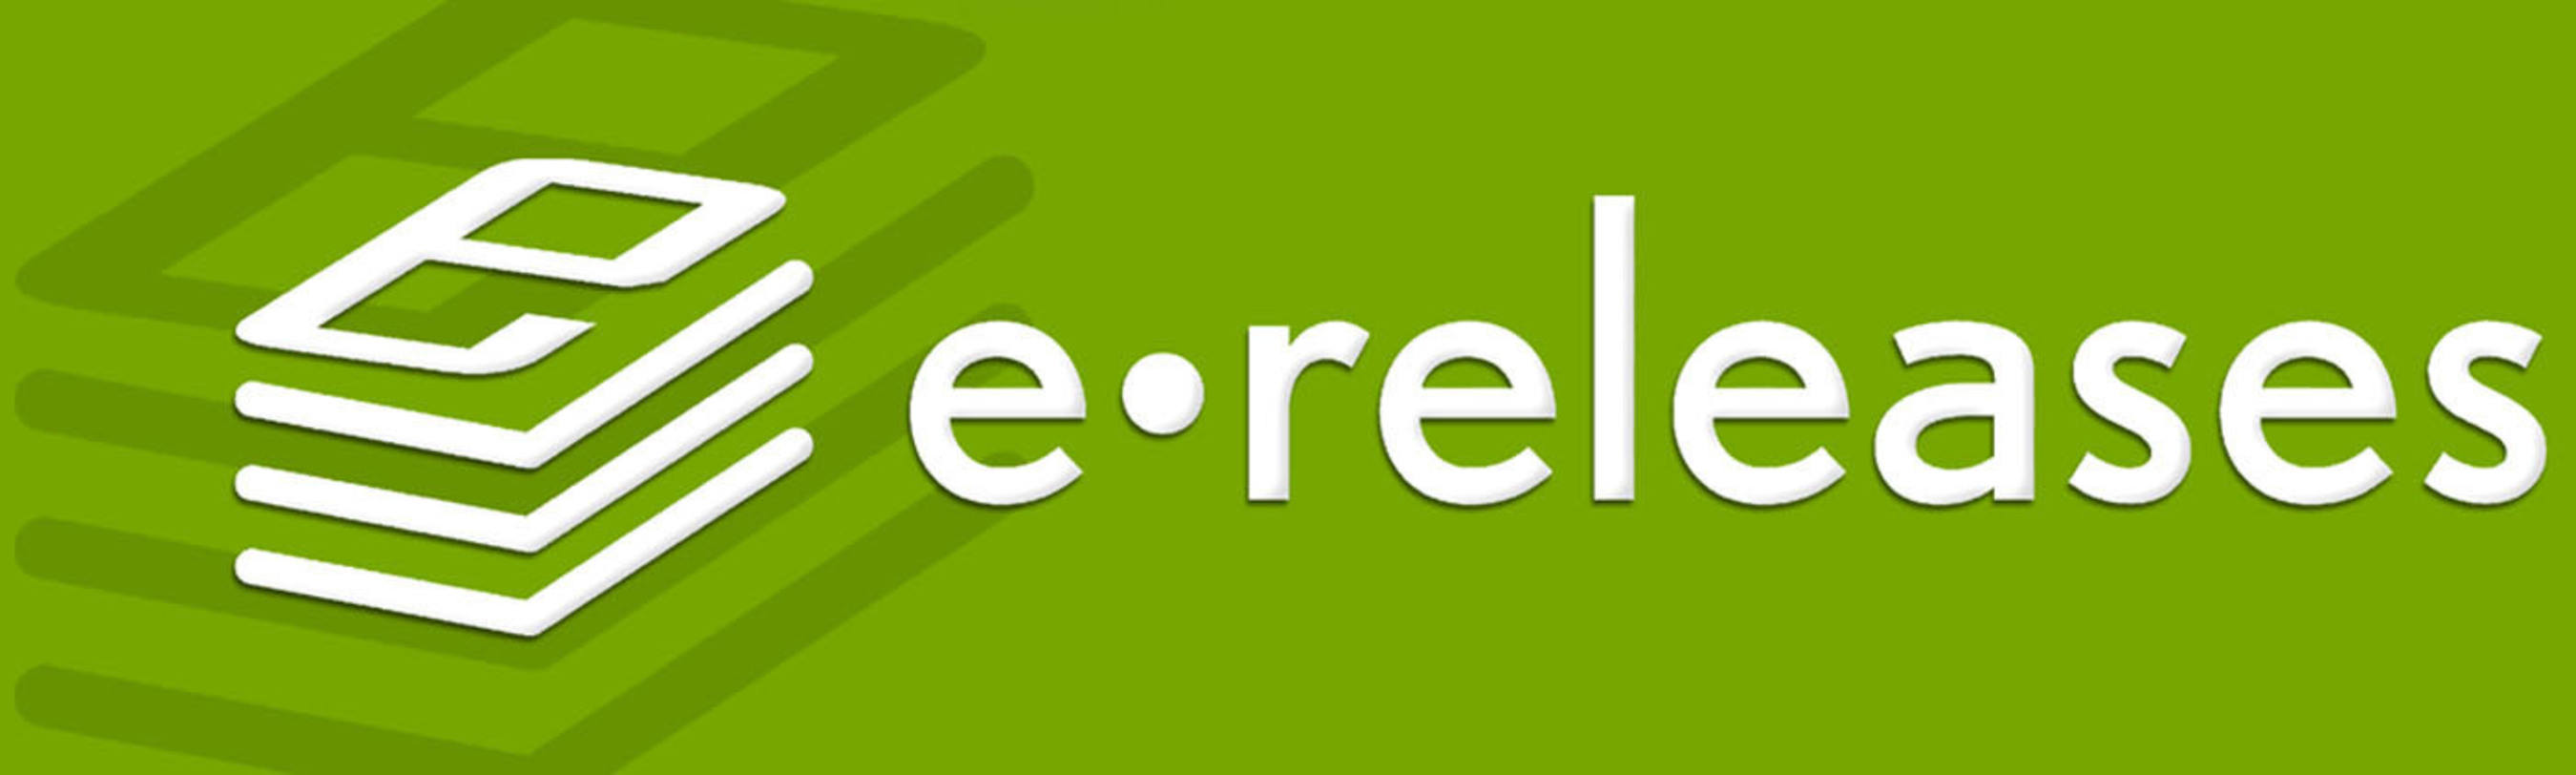 eReleases Logo. (PRNewsFoto/eReleases) (PRNewsFoto/ERELEASES)